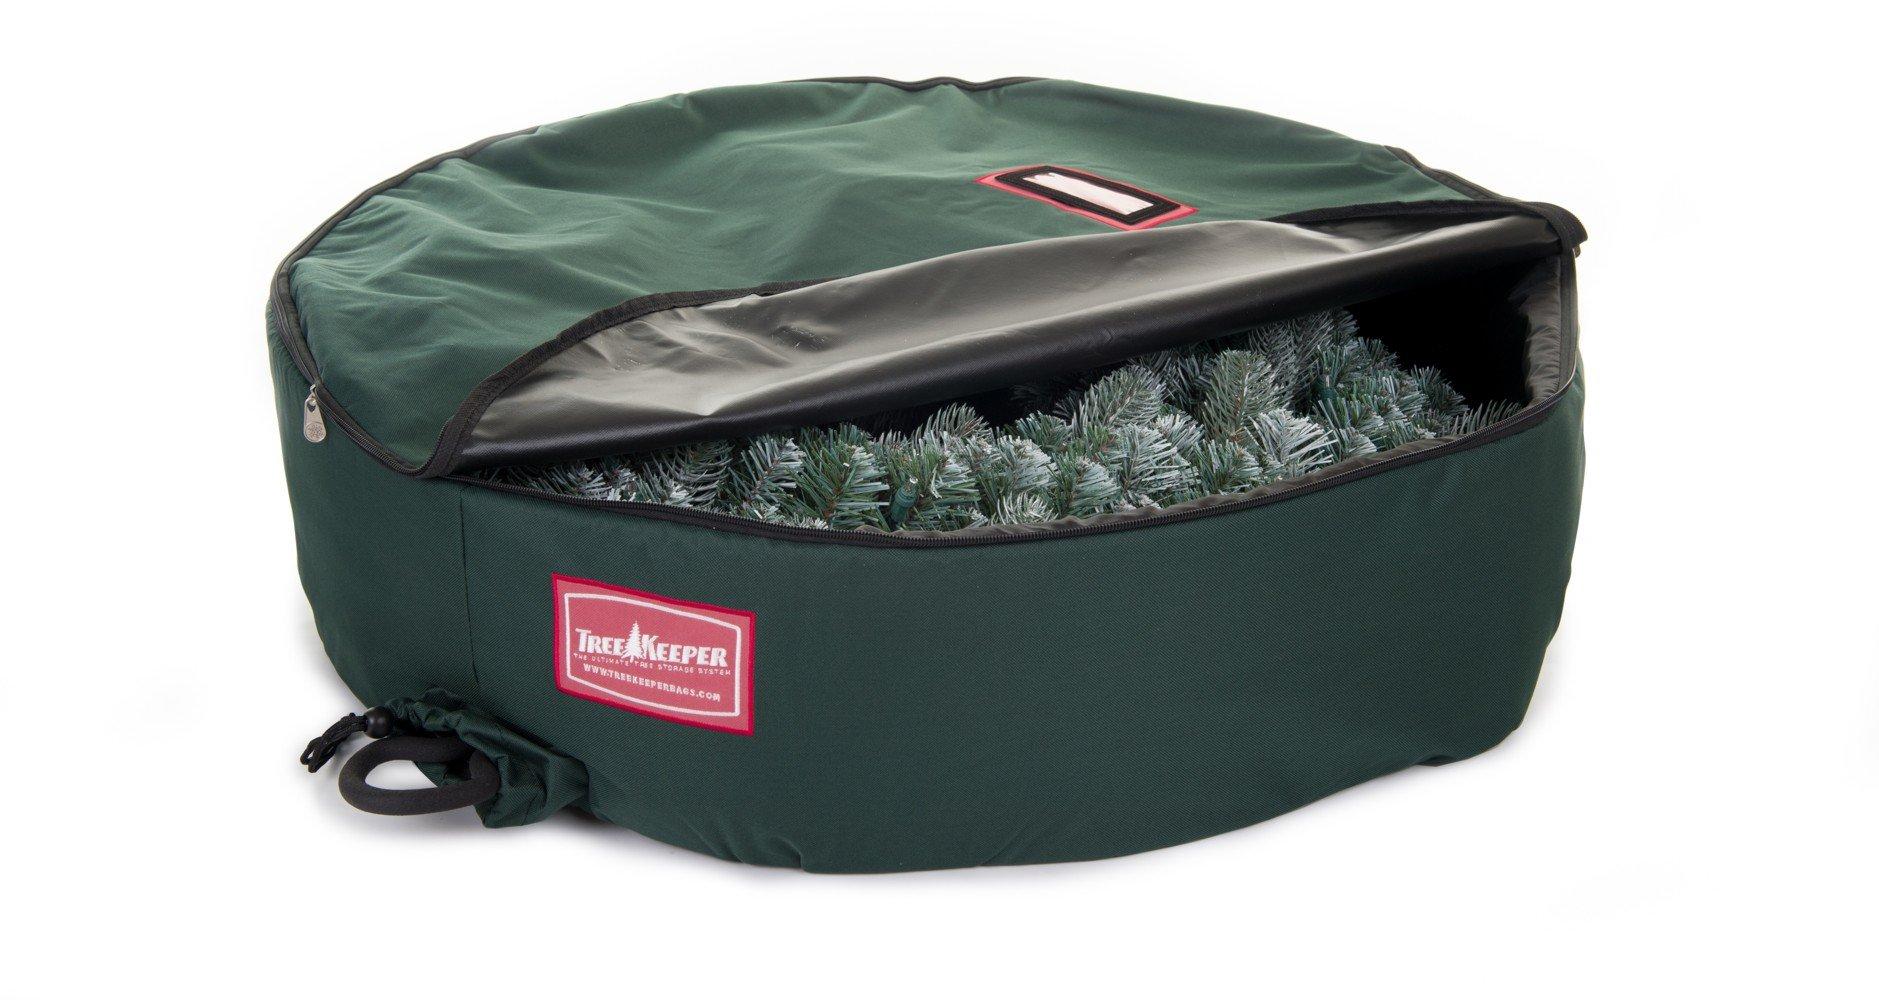 Tree Keeper Wreath Keeper - Artificial Wreath Storage Bag-60 (Green) (60D x 60W x 12H)